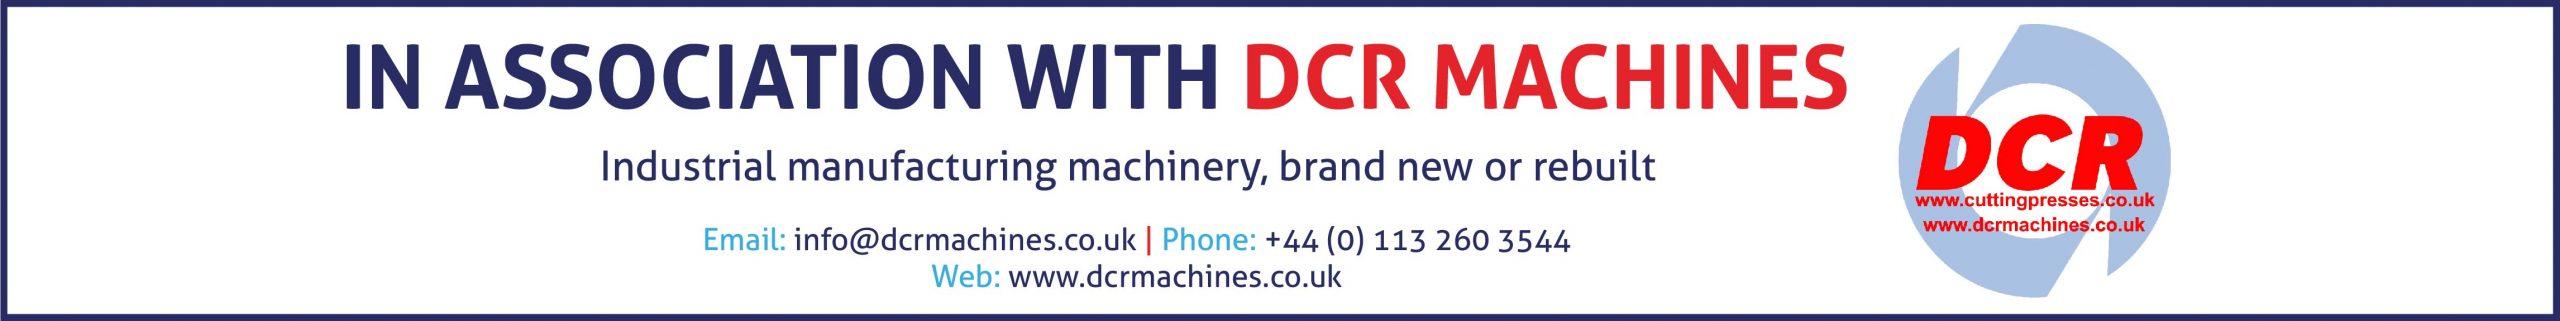 DCR-Machines-Association-Banner-1100px-07-07